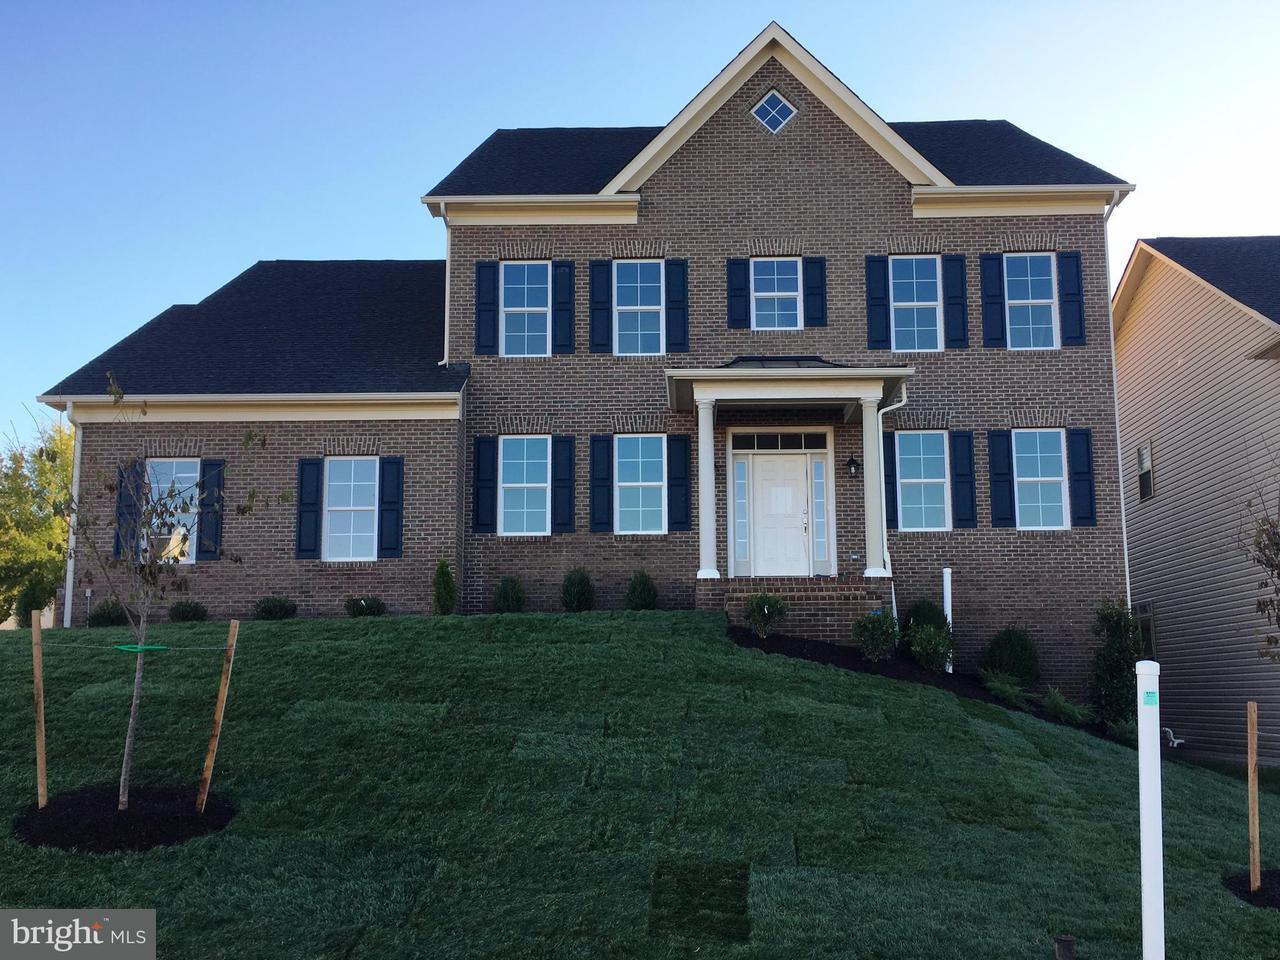 Villa per Vendita alle ore 22007 WINDING WOODS WAY 22007 WINDING WOODS WAY Clarksburg, Maryland 20871 Stati Uniti